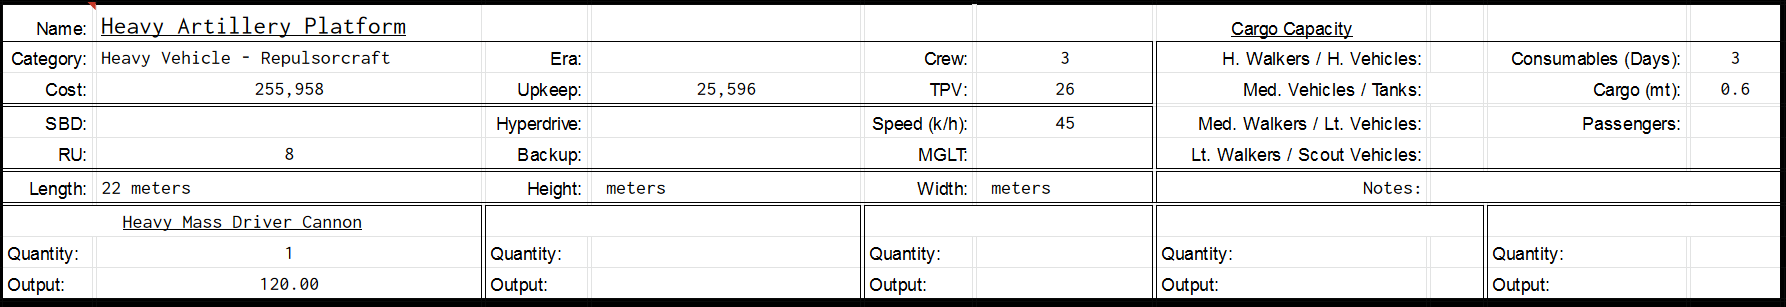 [Image: Heavy_Artillery_Platform.png]